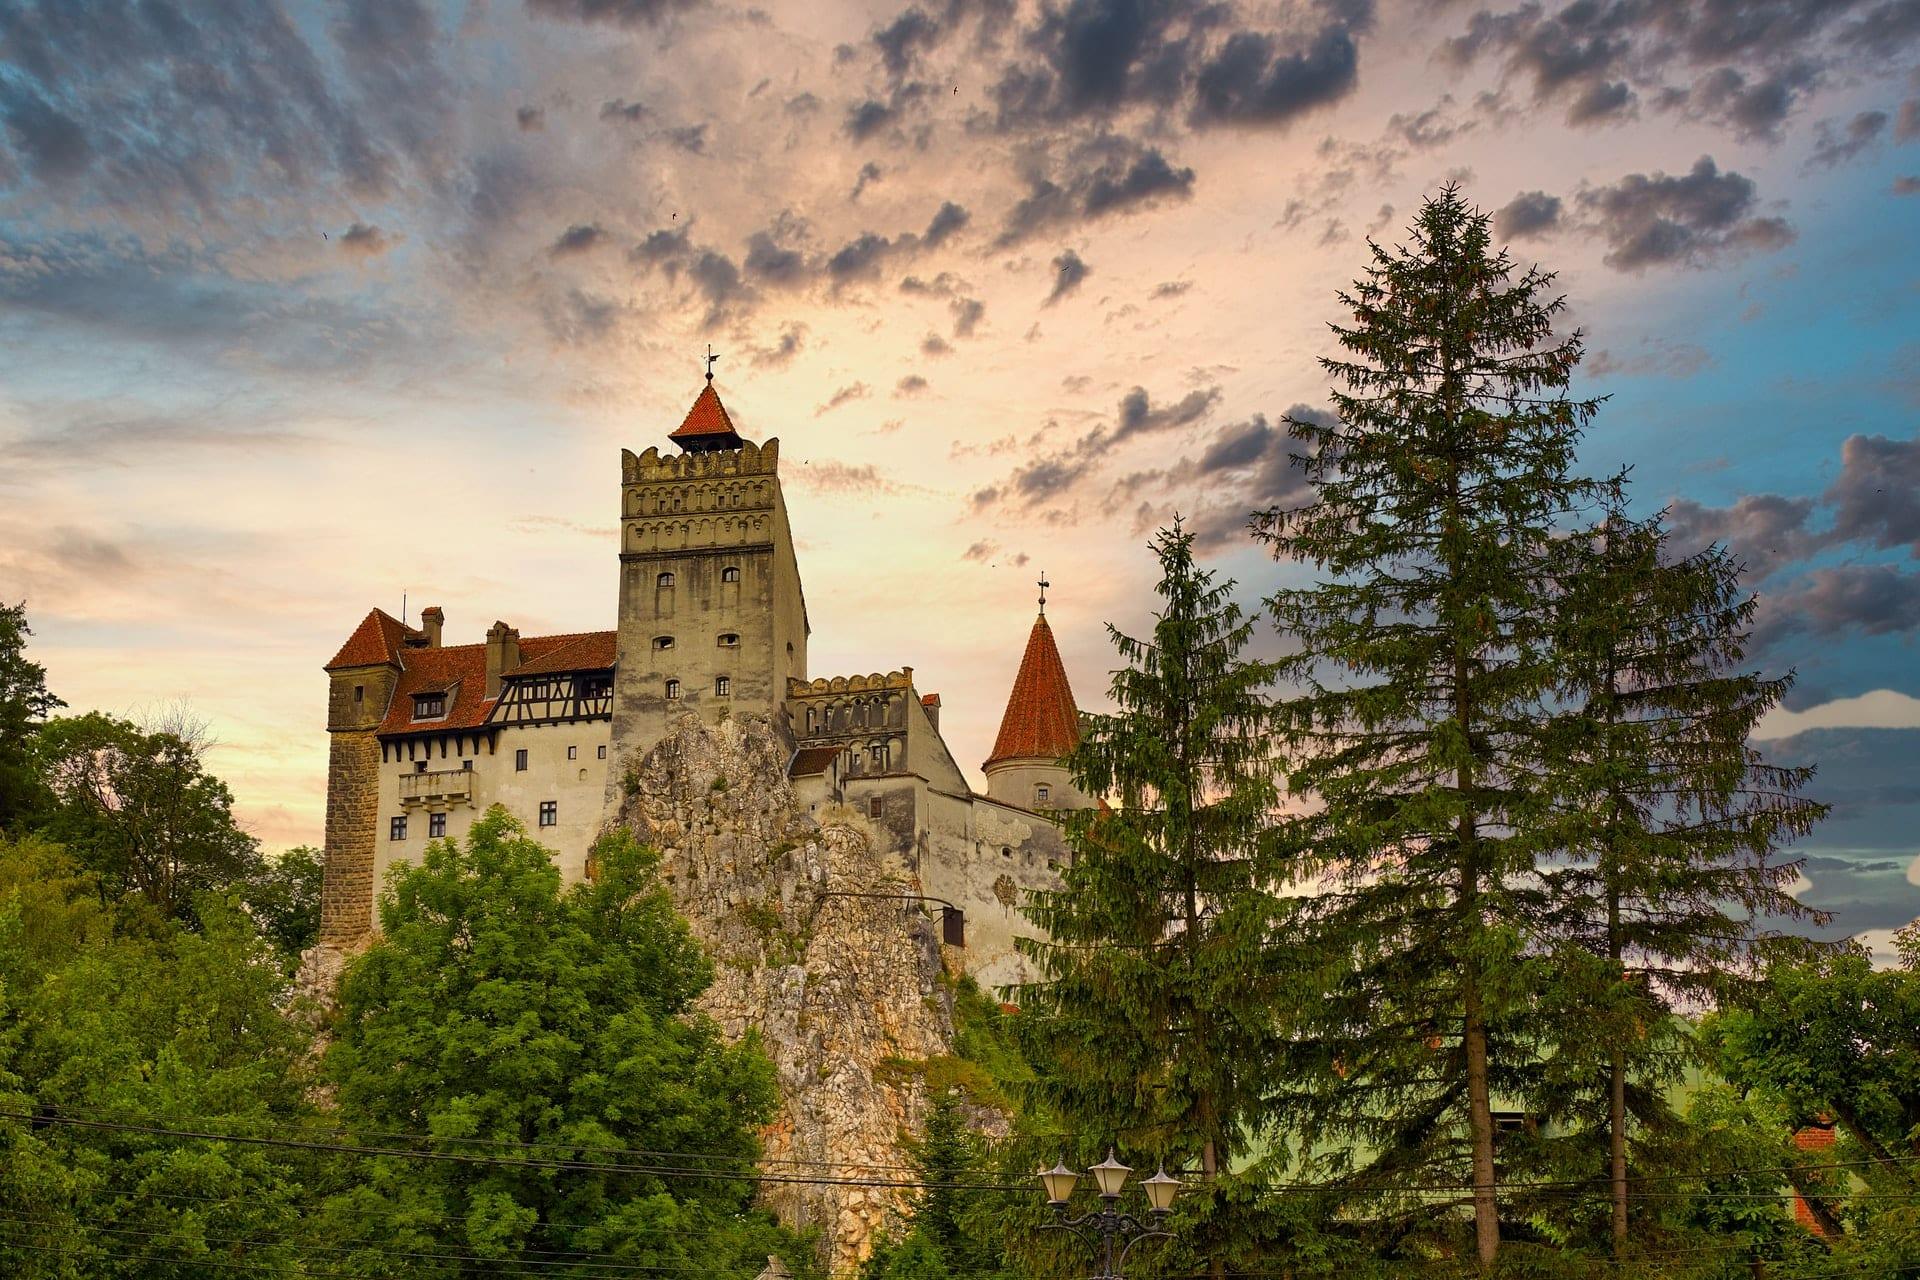 Hrad Bran v Rumunsku